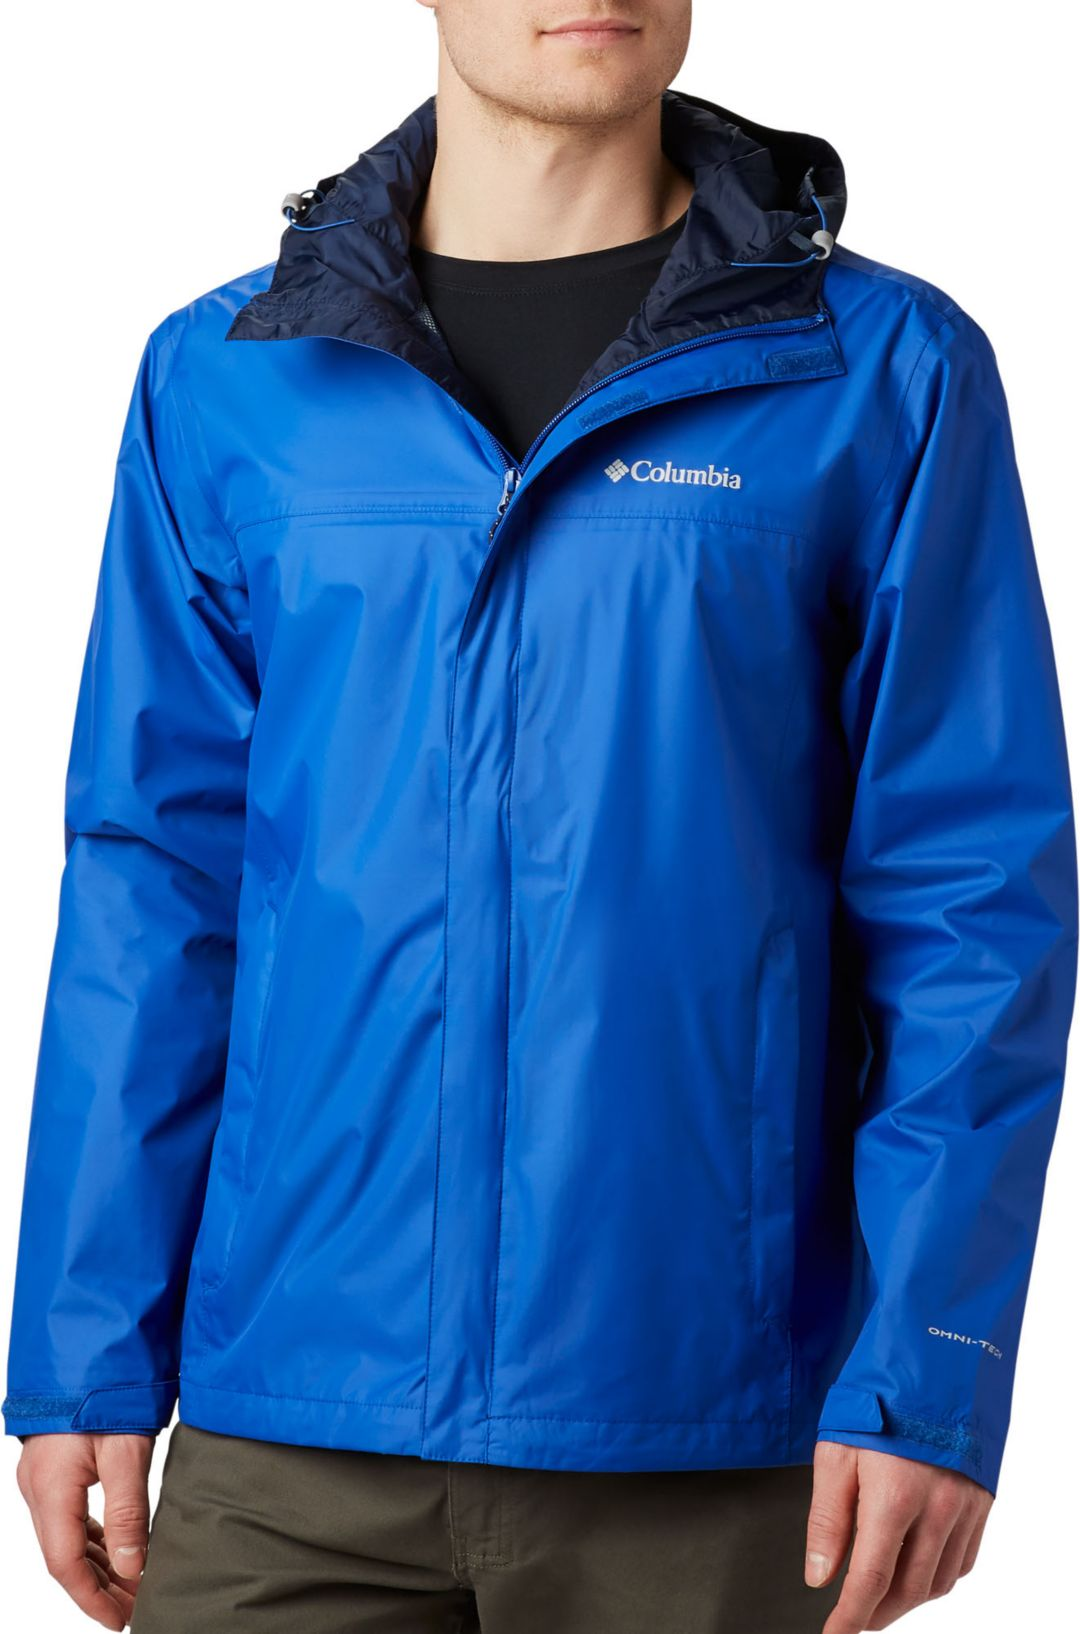 6a336e6f84 Columbia Men s Watertight II Rain Jacket 1